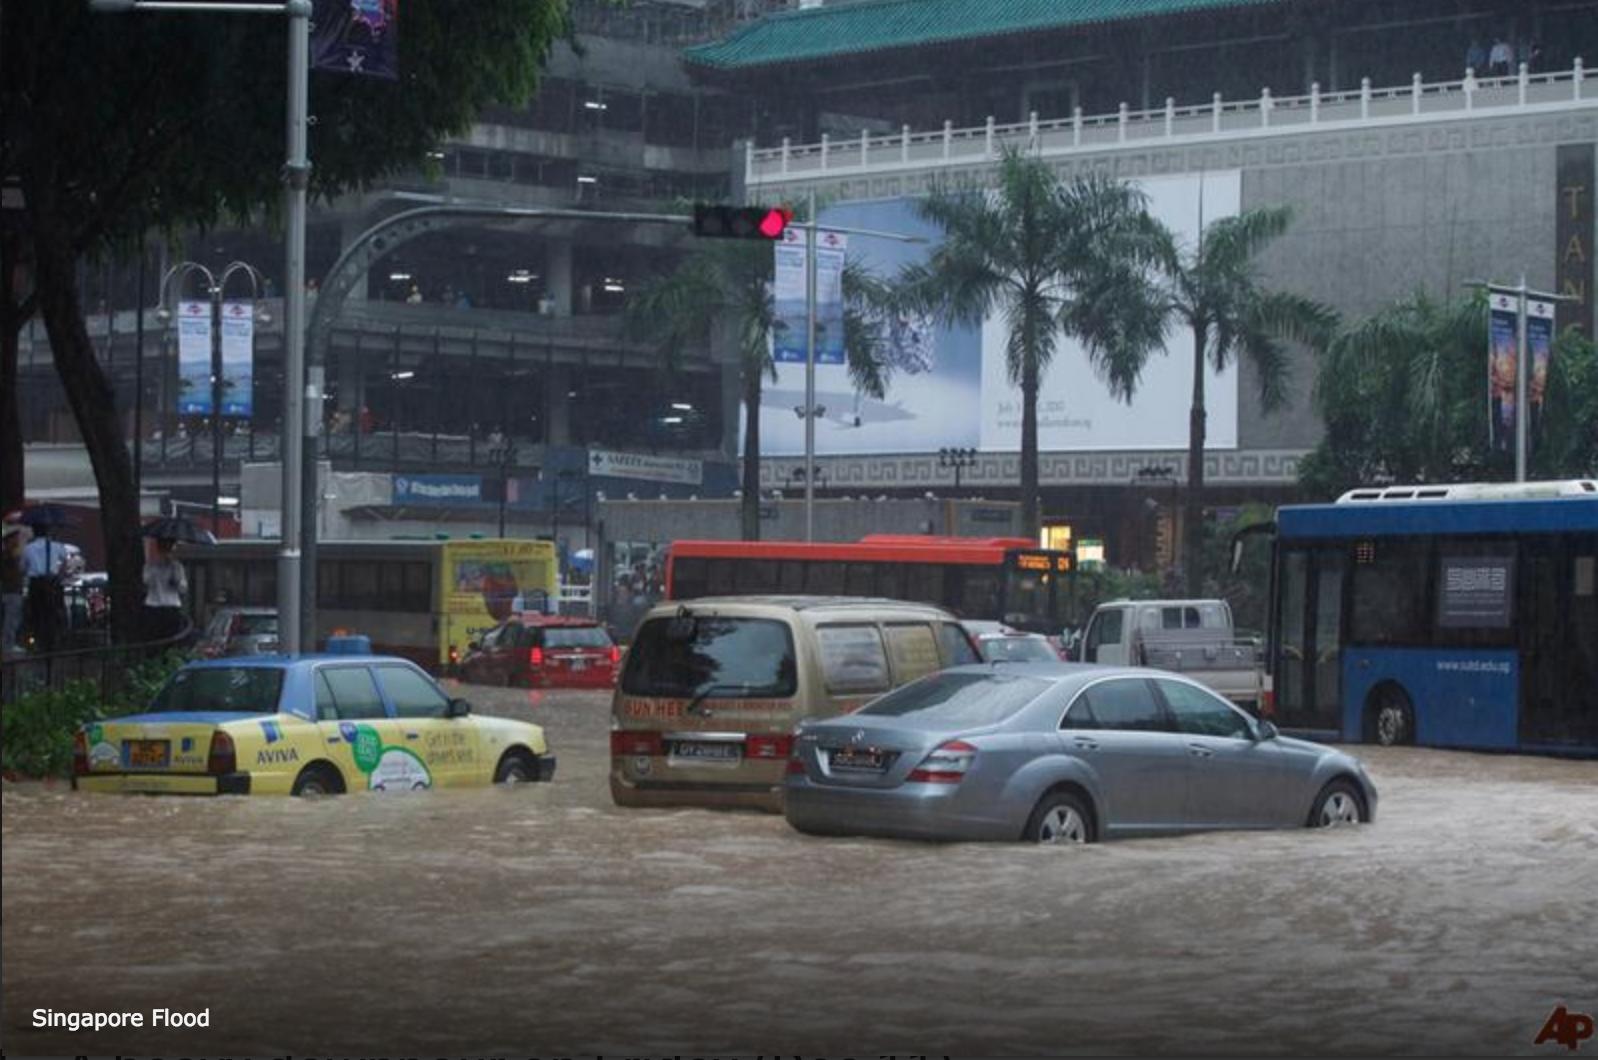 Unit 1: Singapore Flood -